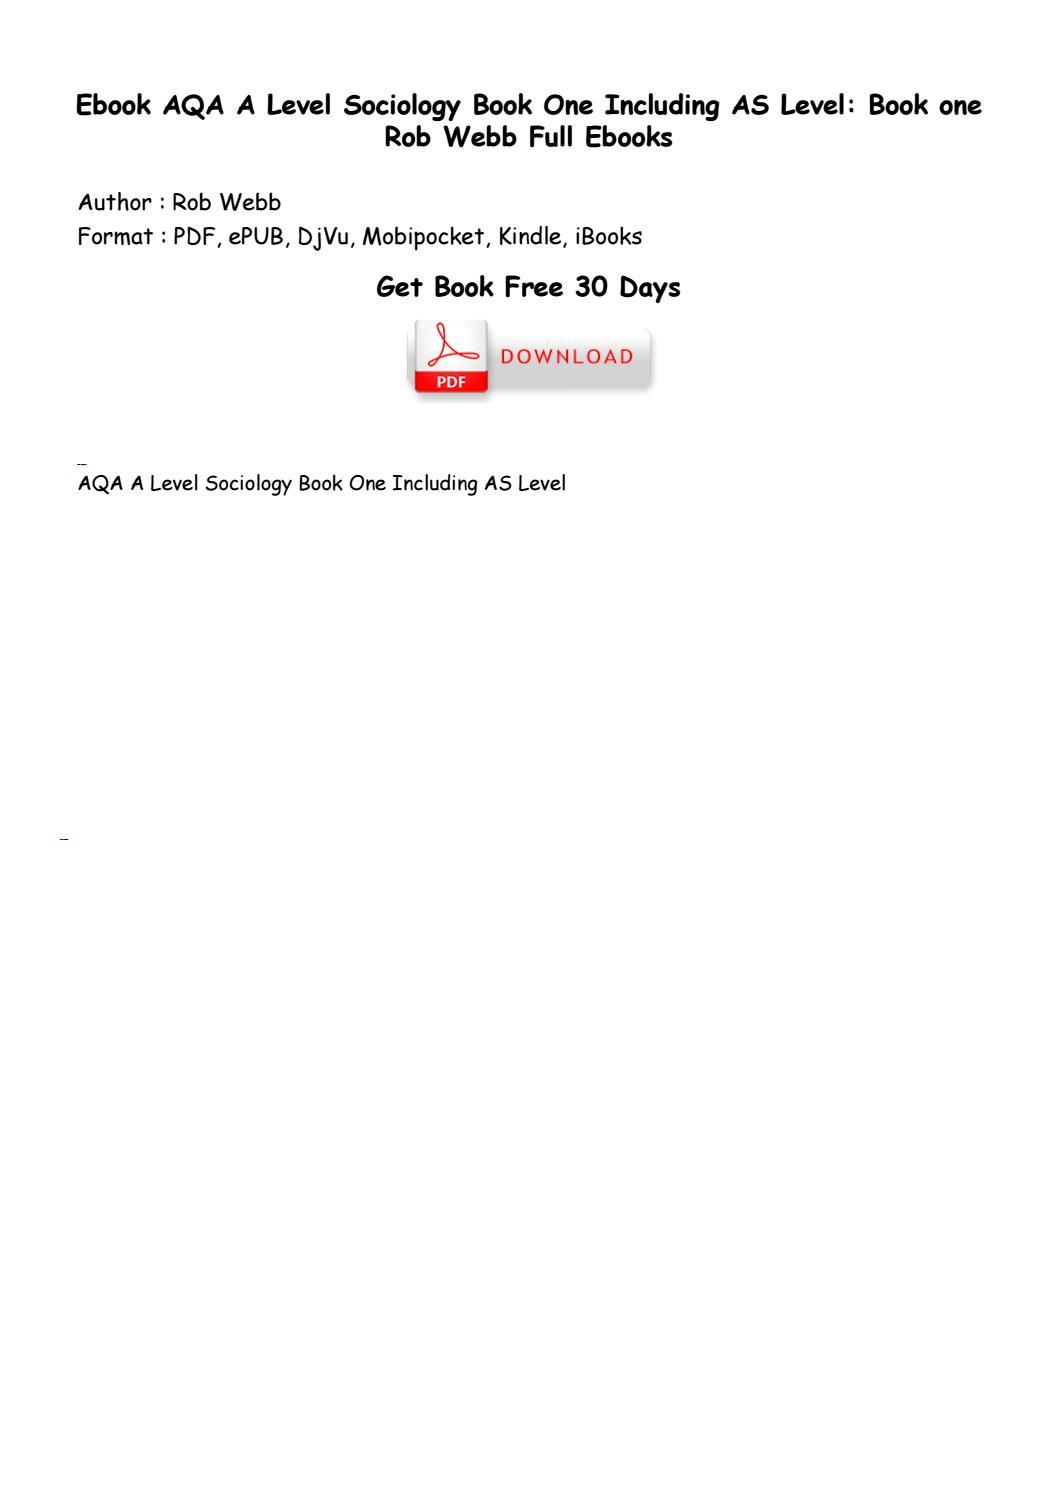 aqa a level sociology book one pdf free